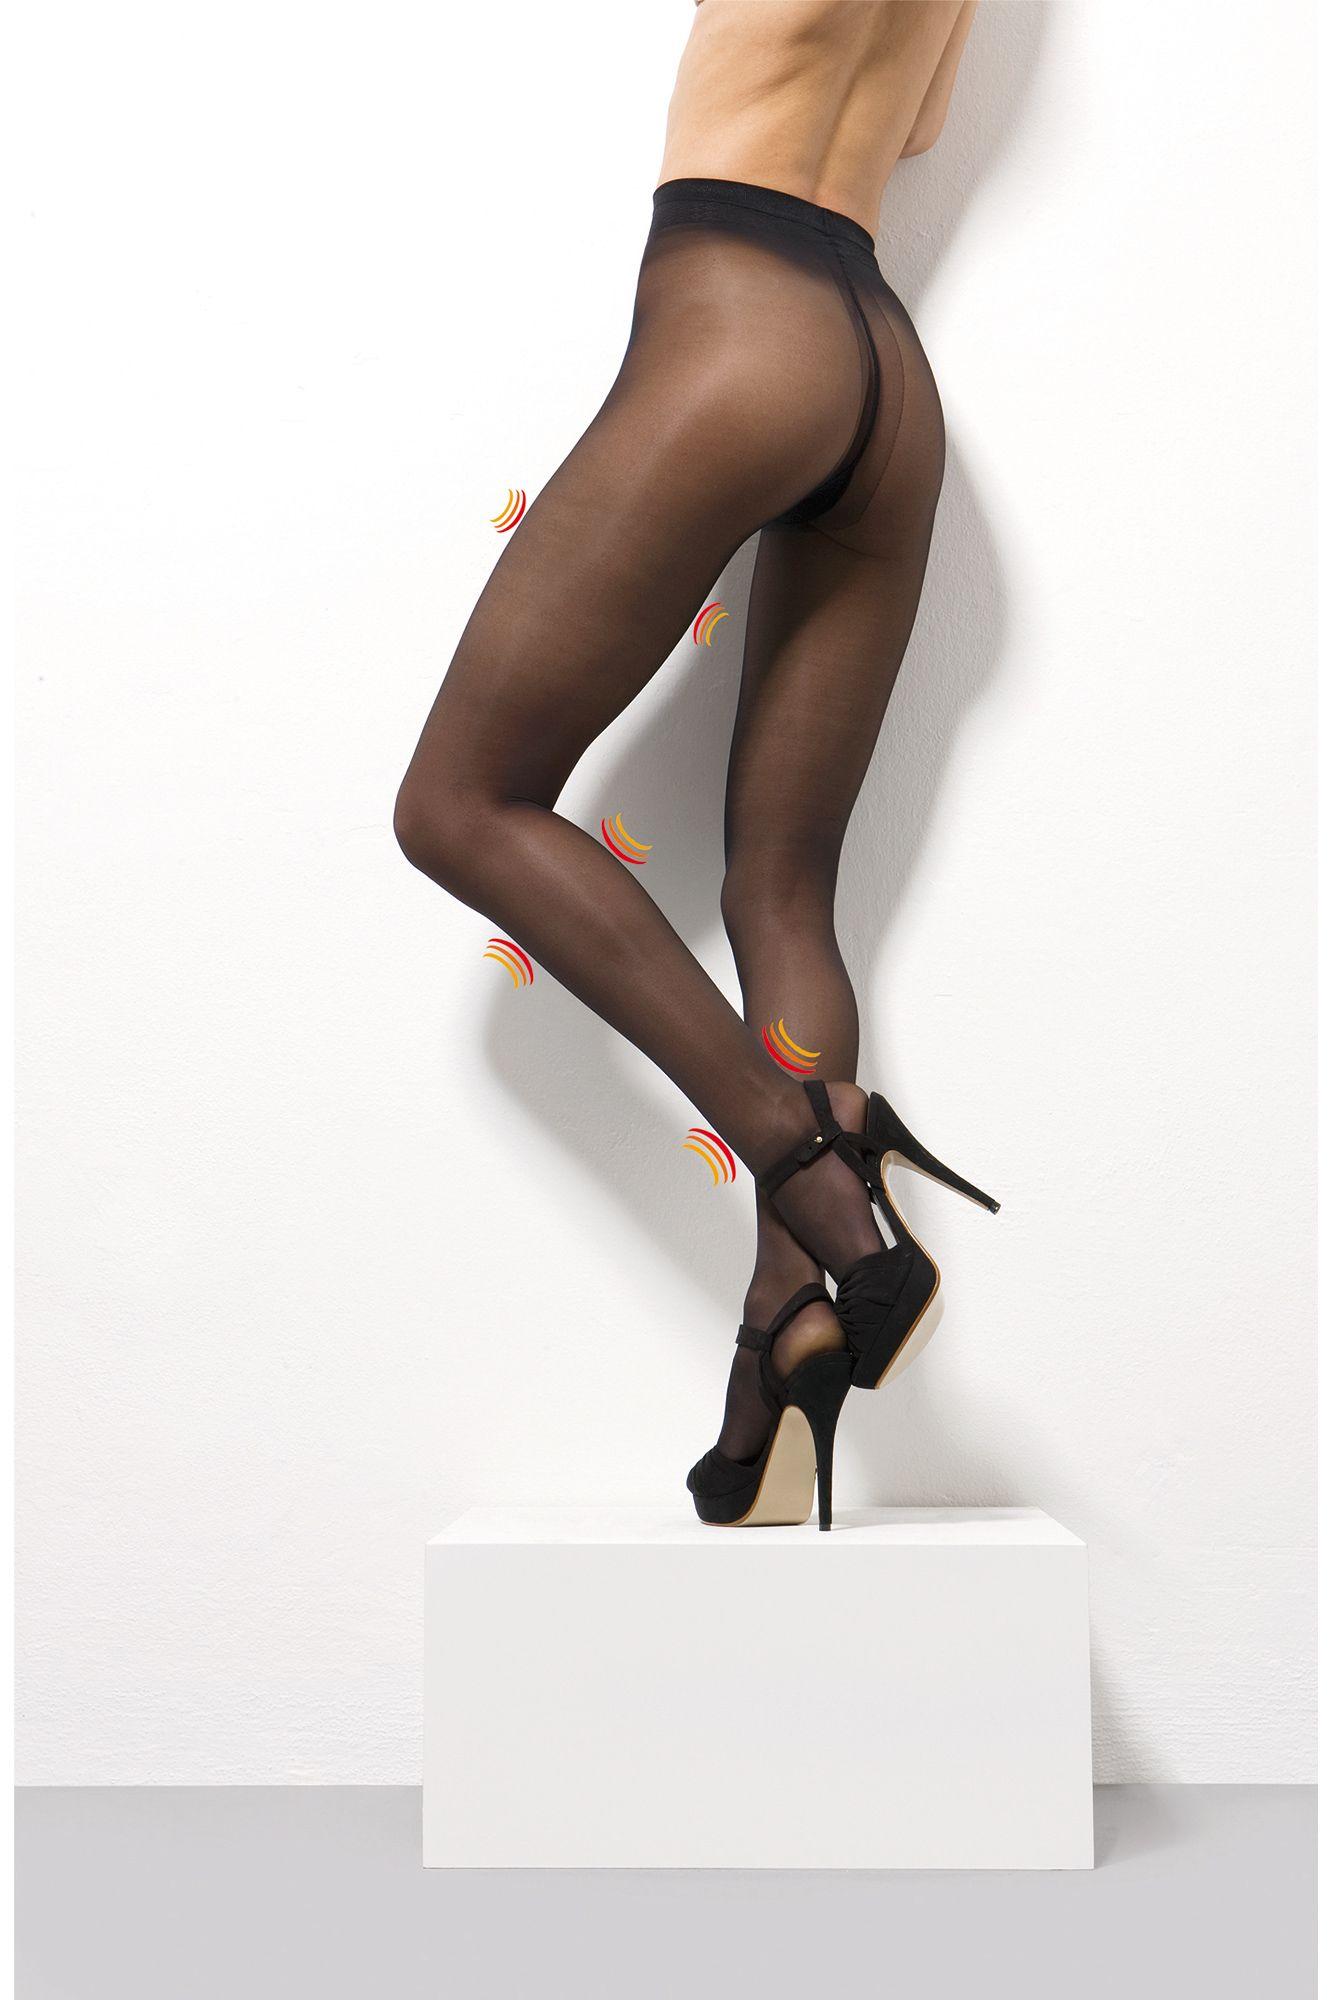 legs-pantyhose-gallery-rating-pantyhose-lesbians-seduce-straight-girls